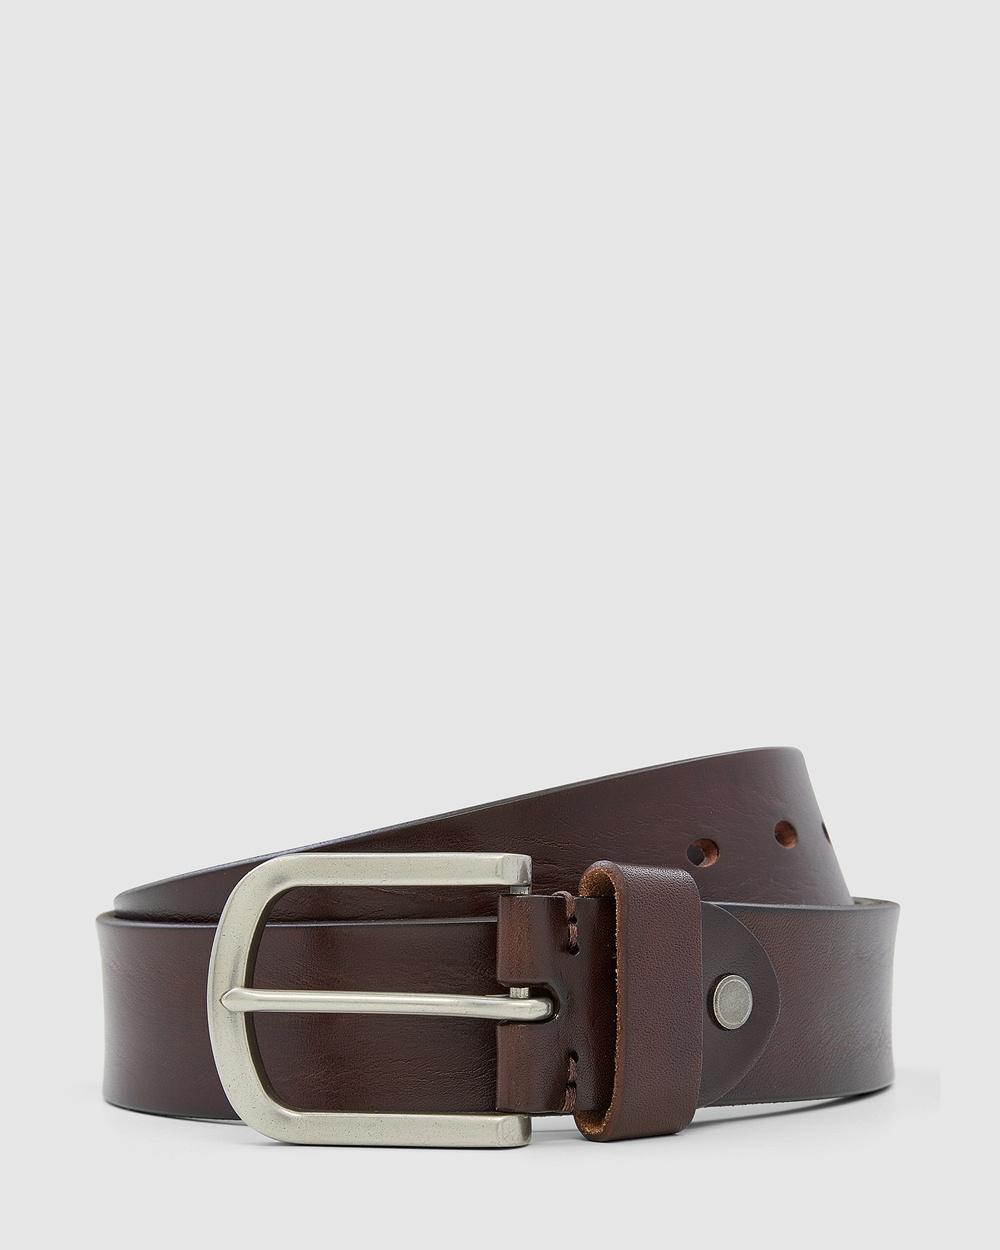 Aquila Renford Belt Belts Brown